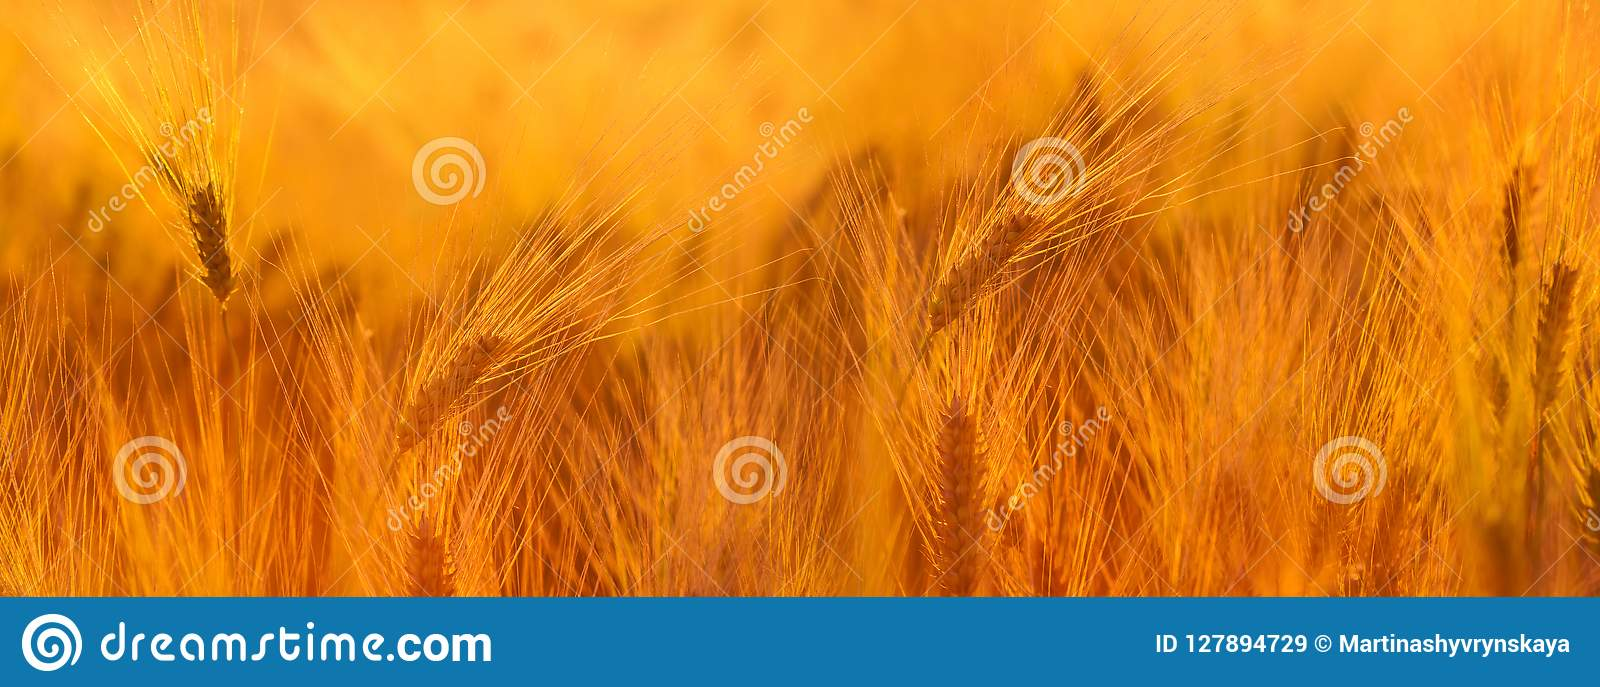 Wheat field. Ears of golden wheat close up. Beautiful Nature Sun